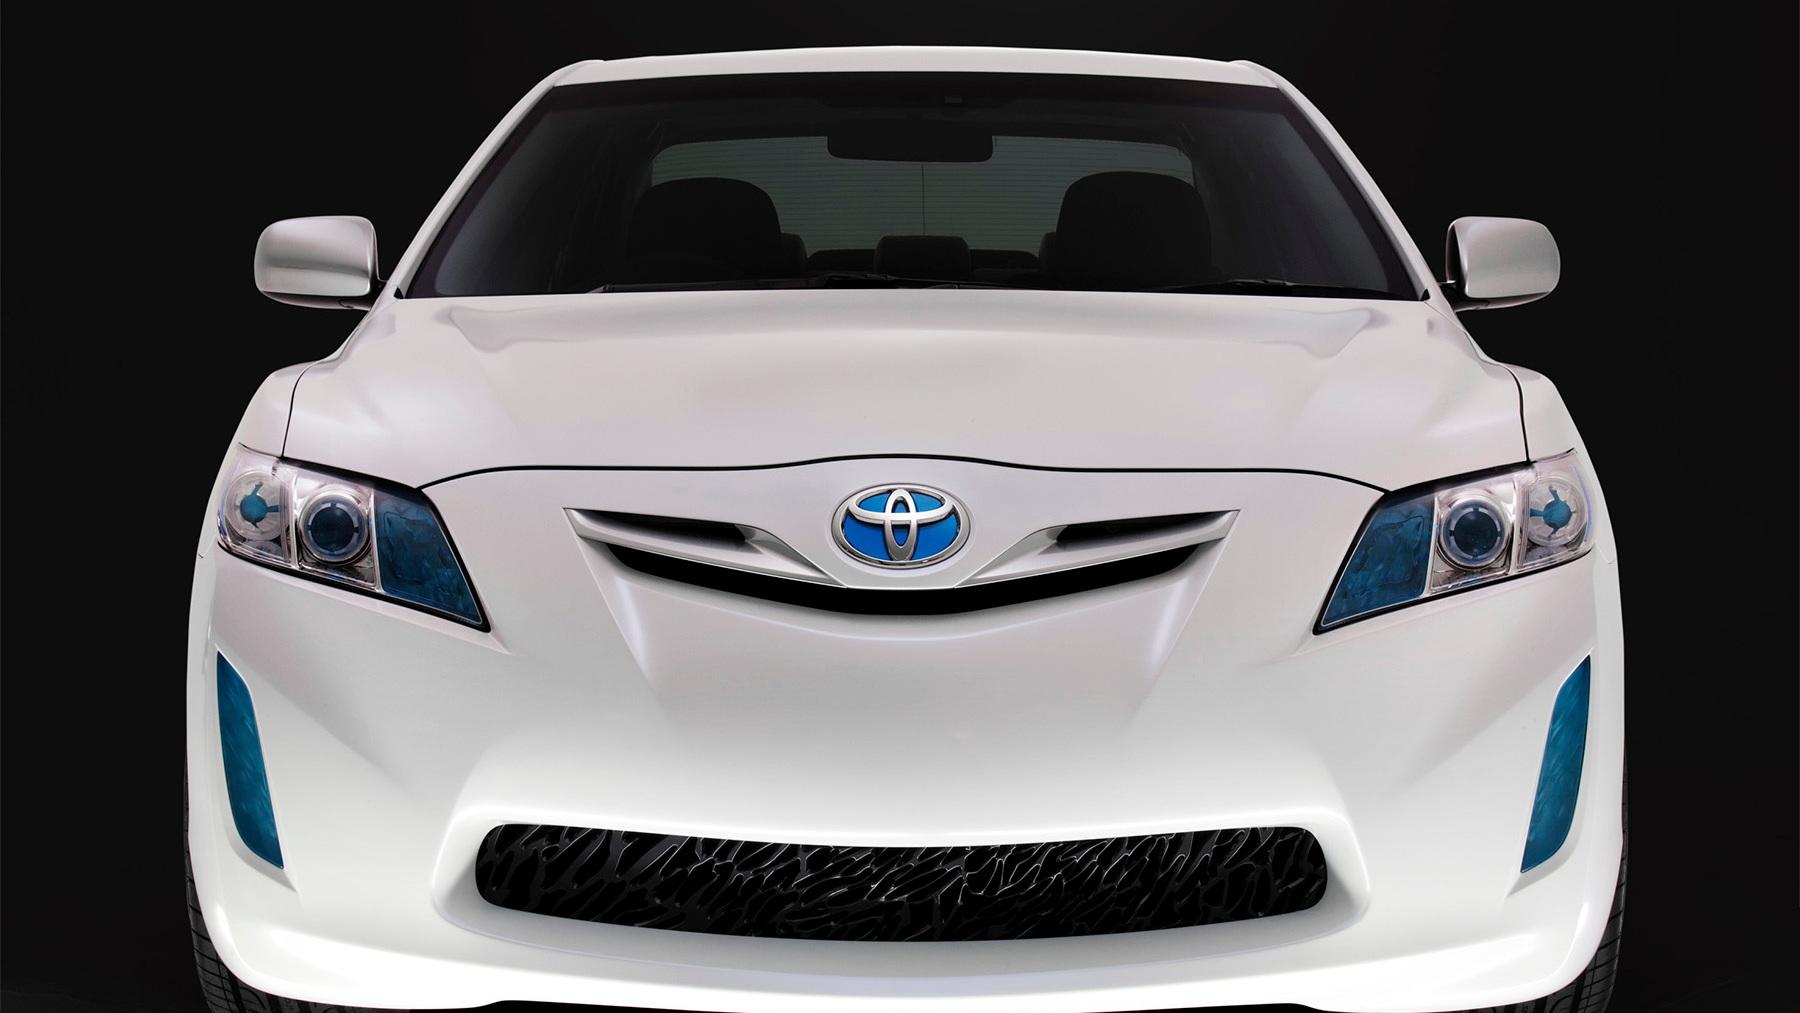 2009 toyota hc cv hybrid camry concept 001